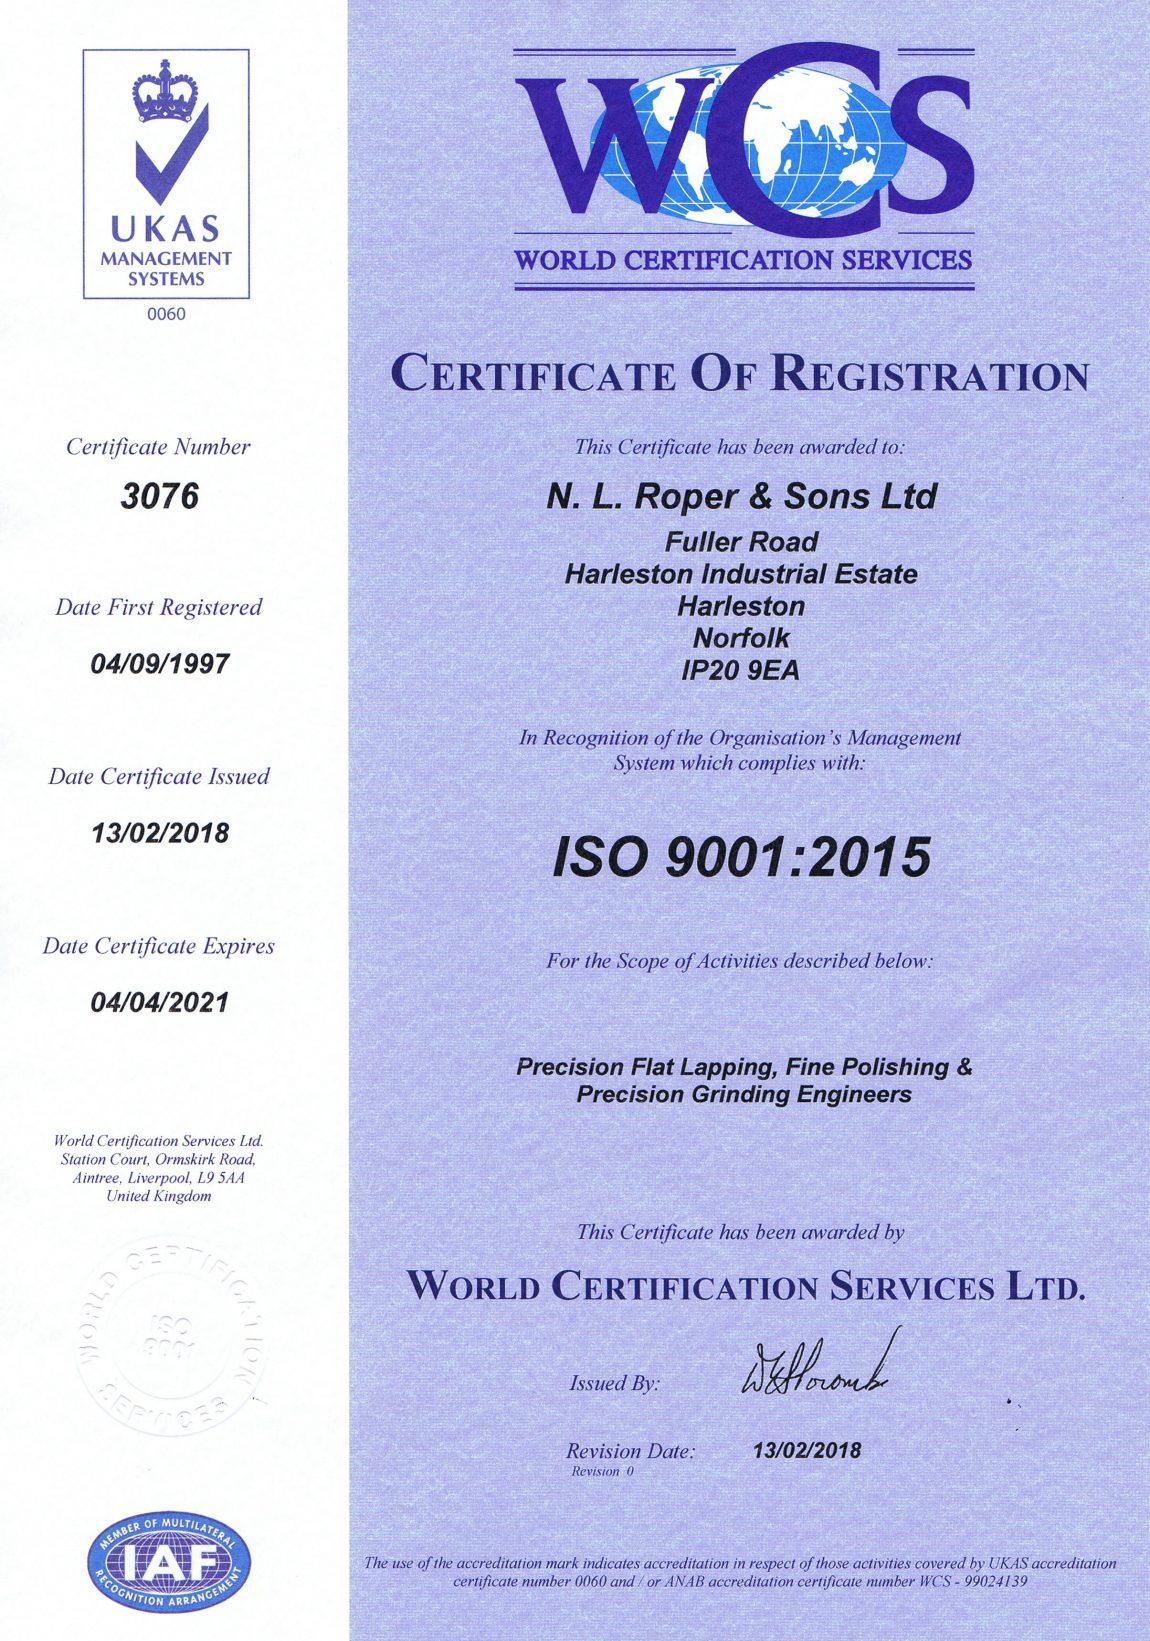 WCS-ISO9001.jpg